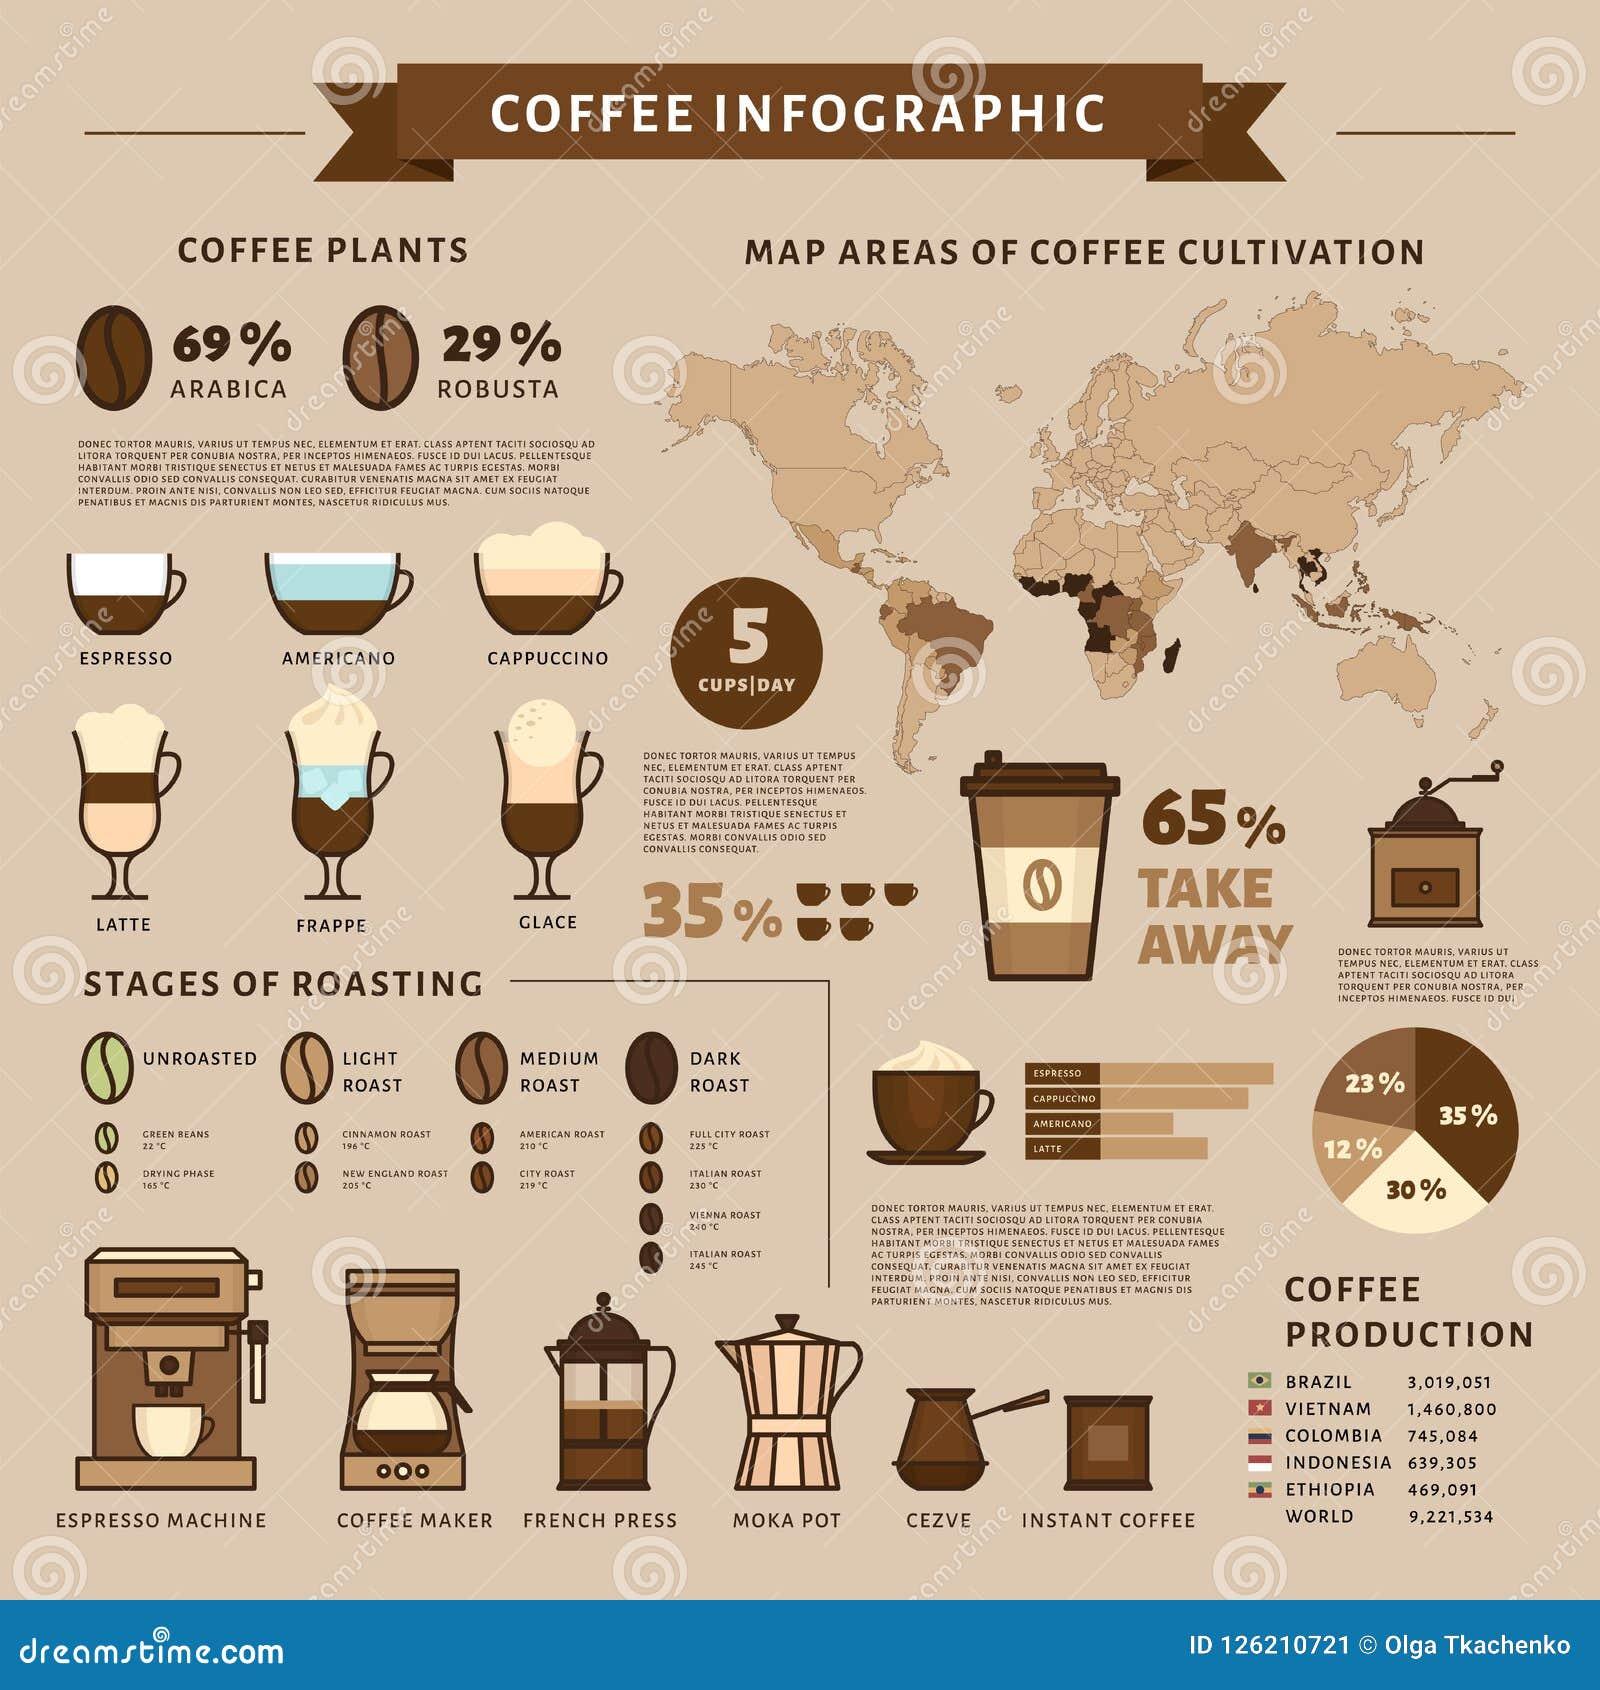 Café infographic Tipos de café Estilo plano, illustra del vector